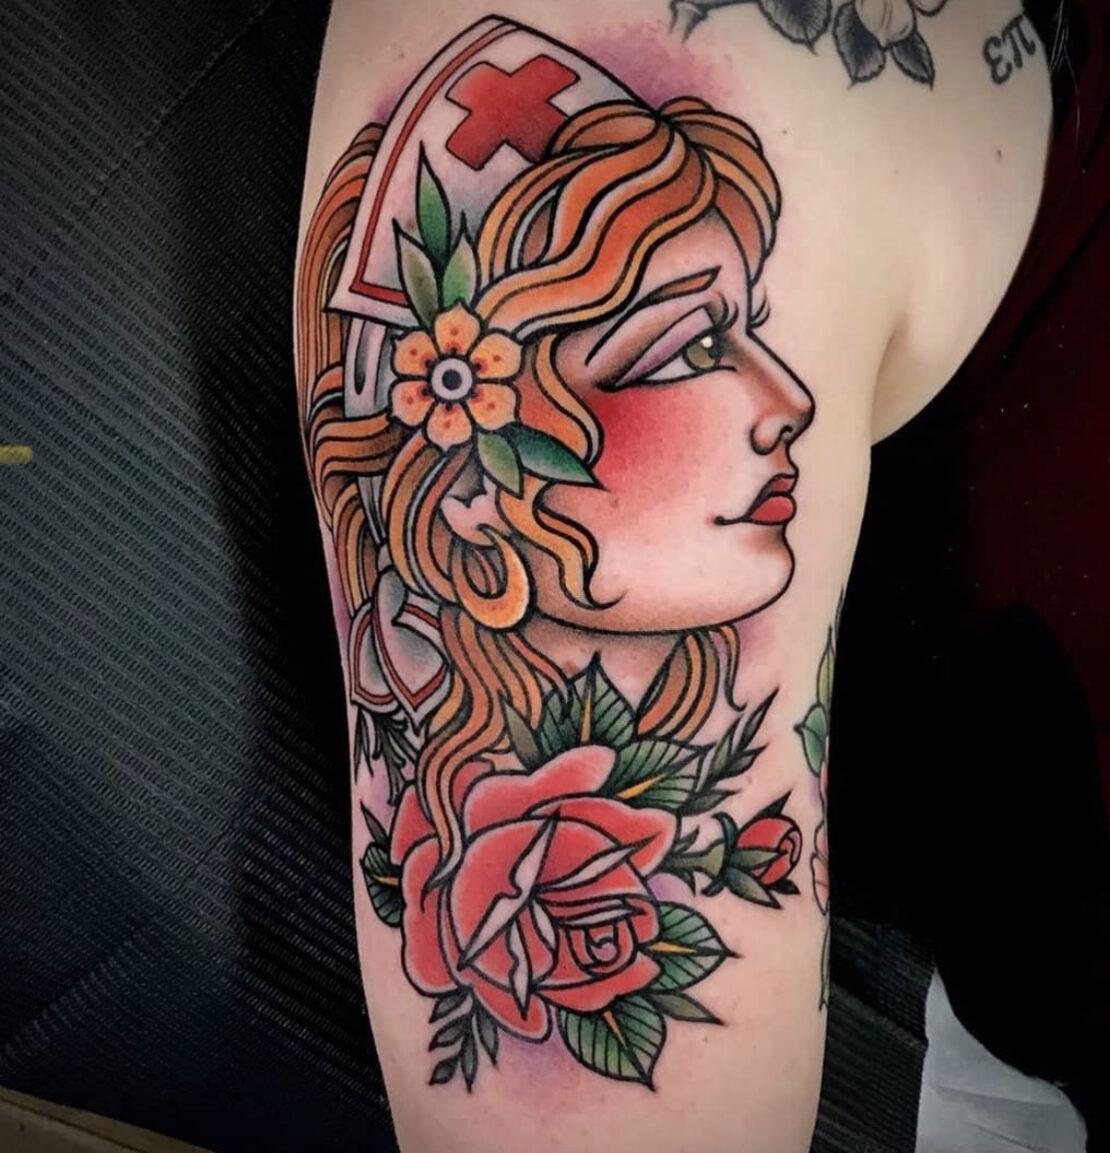 Amanda Slater, Lakeside Tattoo Co., Richmond, USA